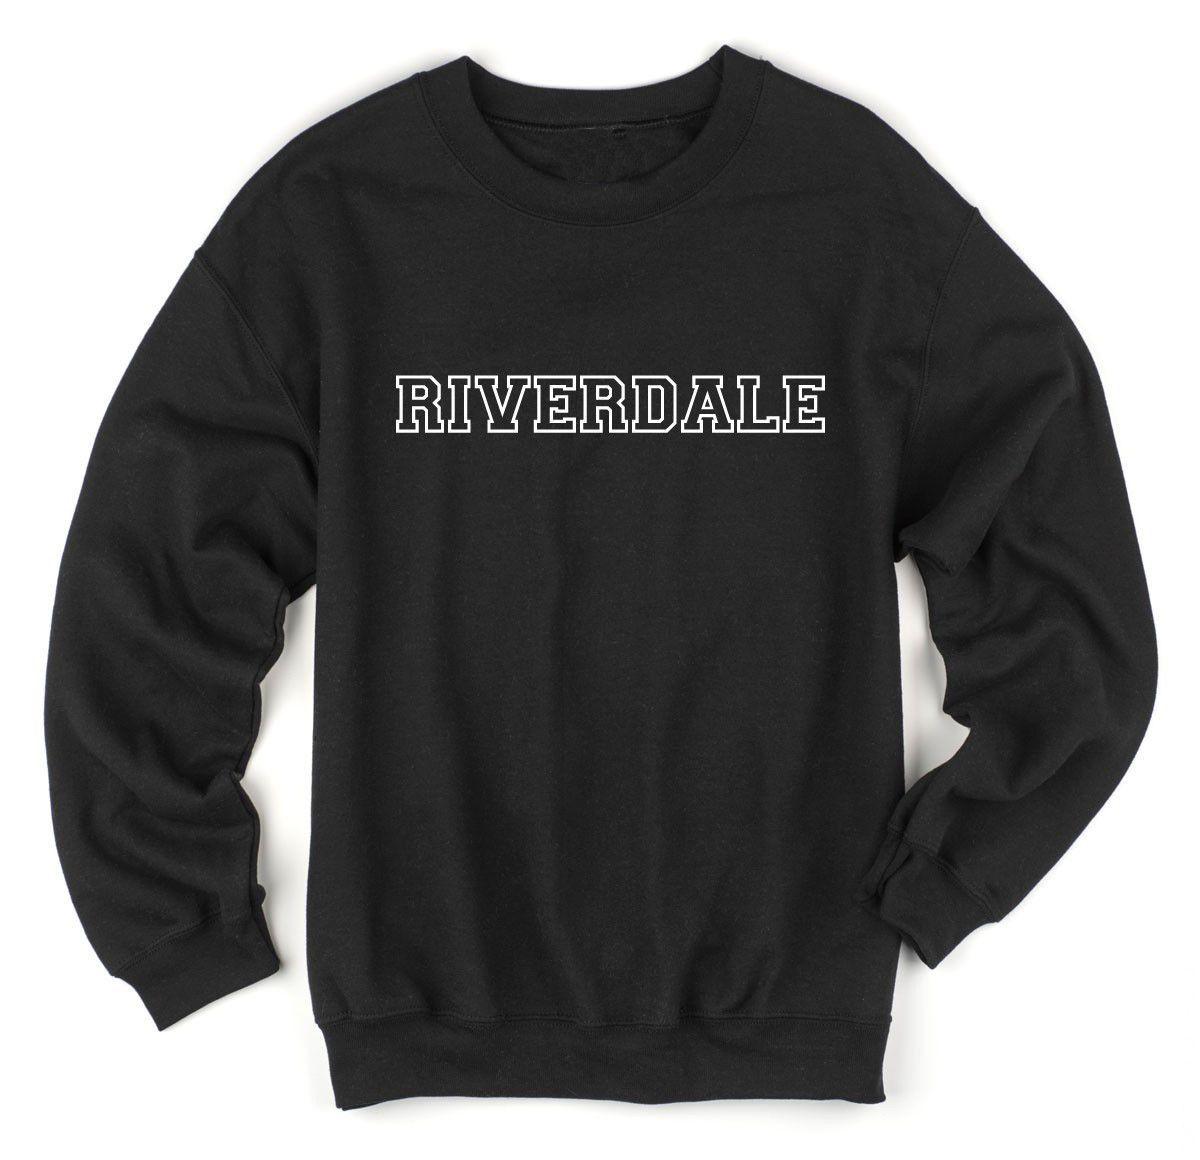 gran venta 8097c ae4ce Riverdale Sweatshirt en 2019 | Riverdale | Ropa tumblr ...